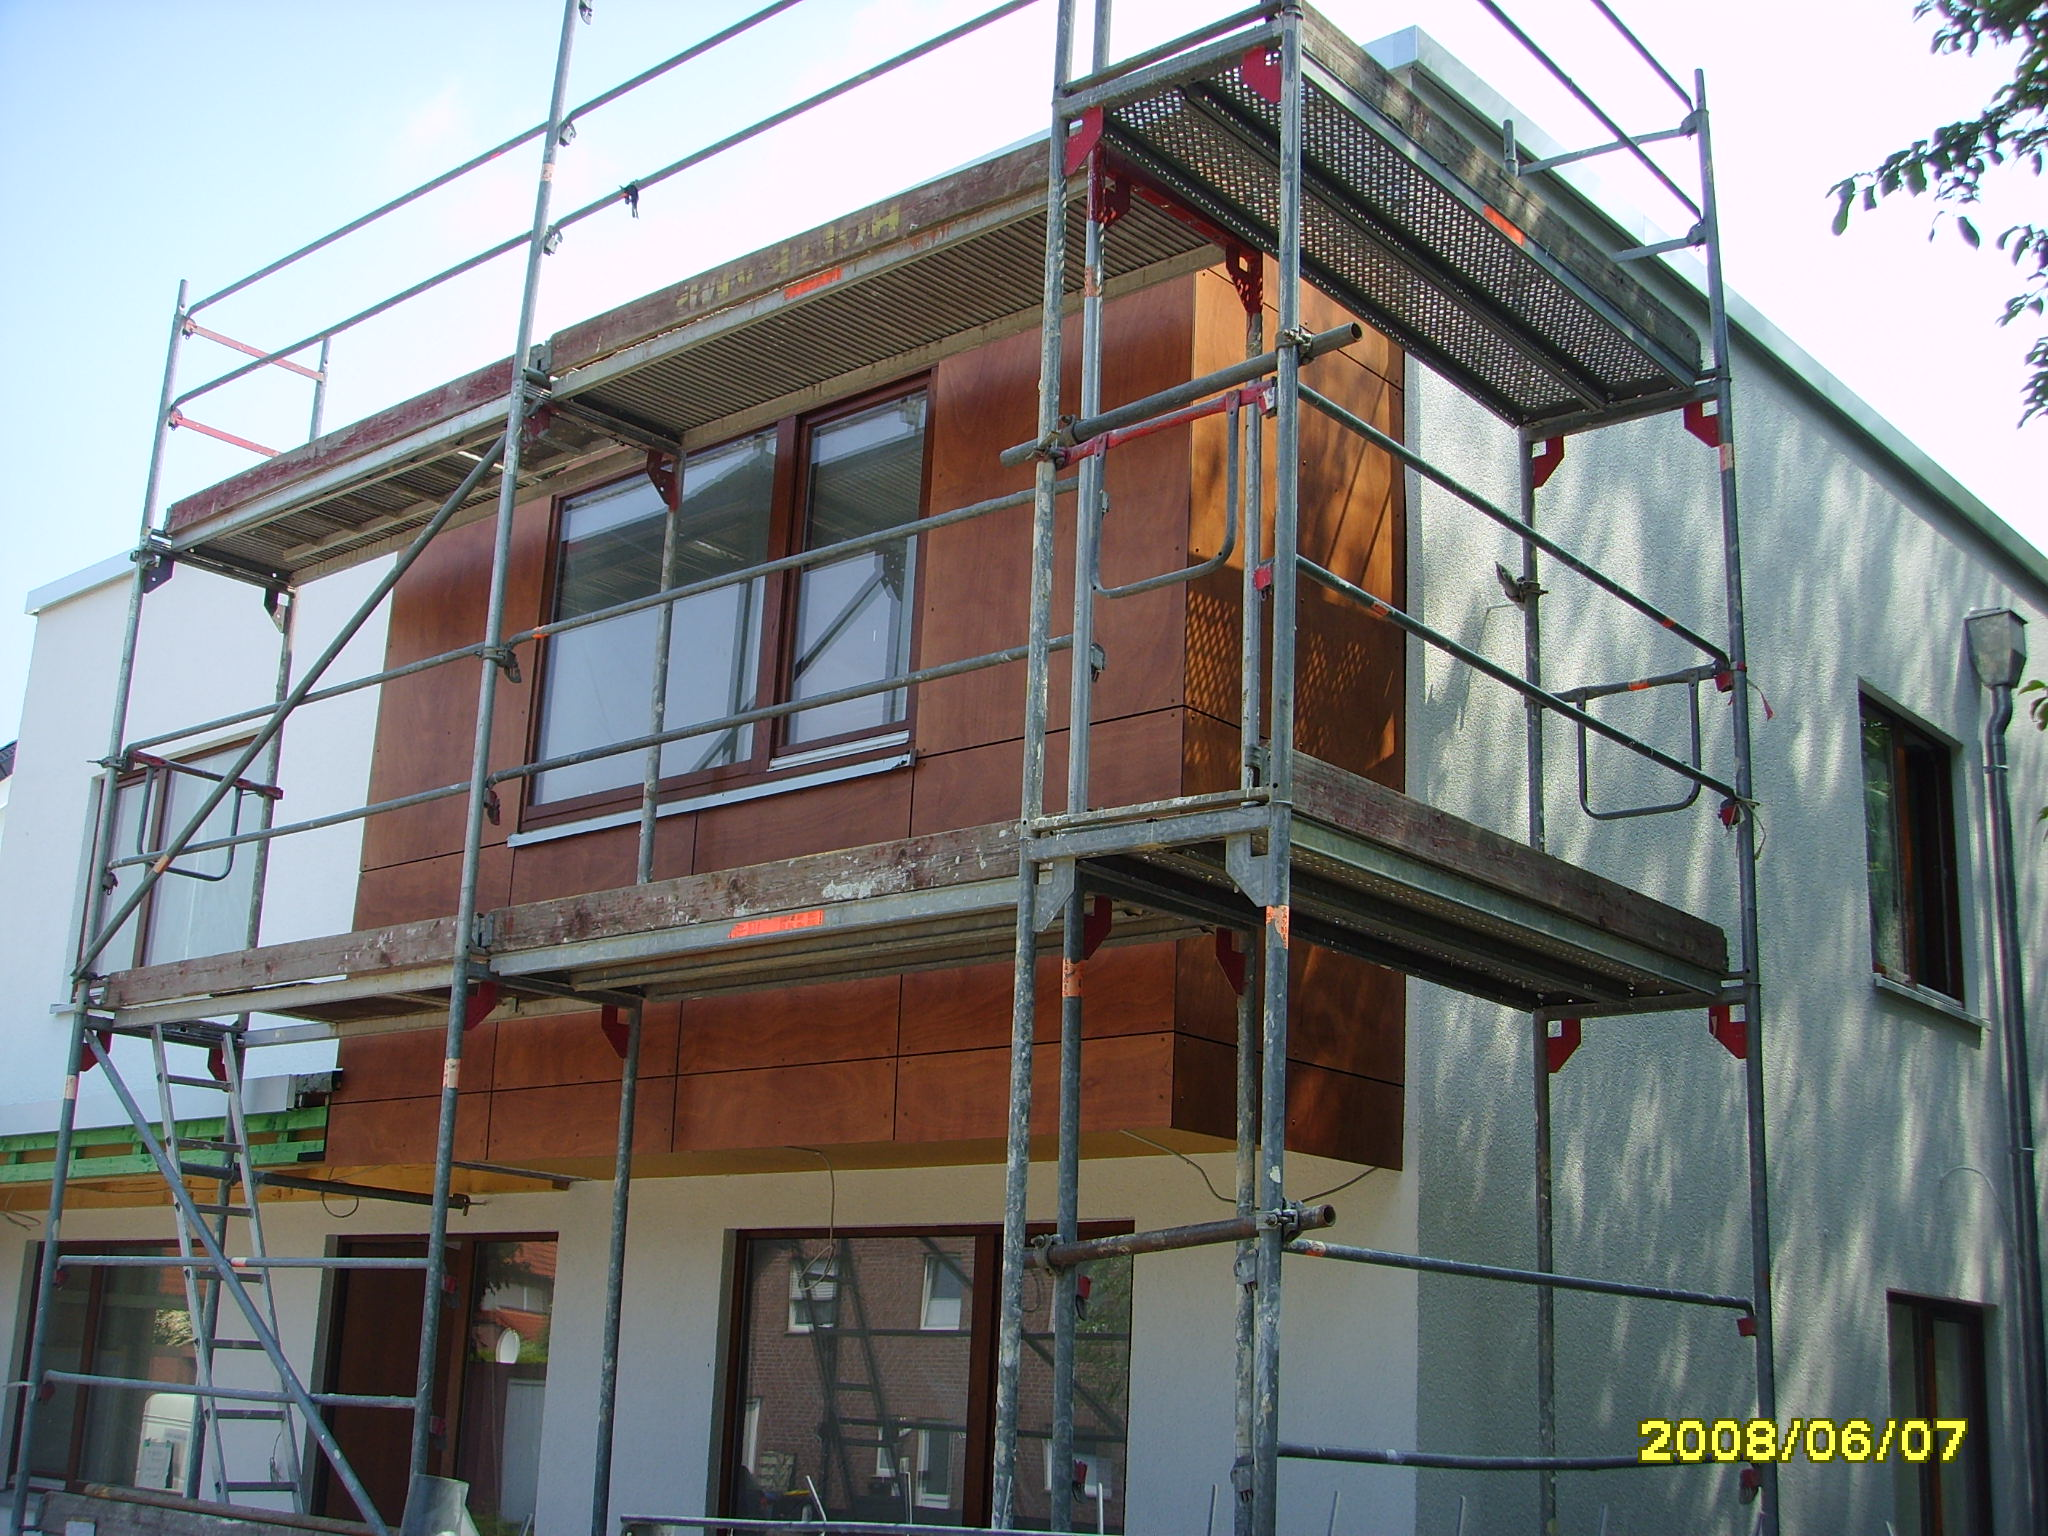 24 kw fassade holzhaus fertighaus holzbau anbau umbau. Black Bedroom Furniture Sets. Home Design Ideas